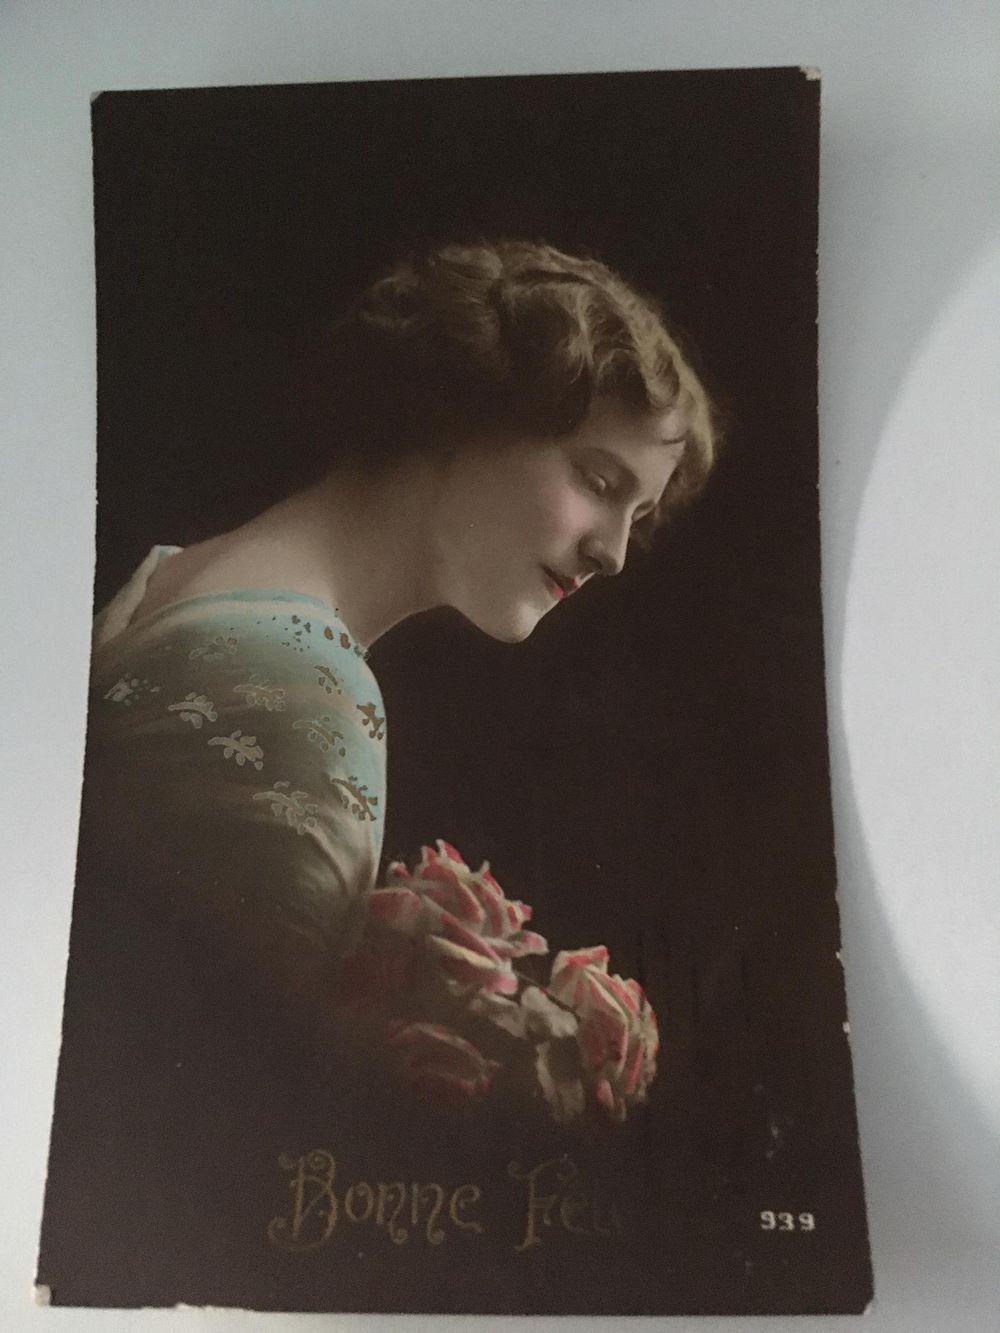 Fresco - image 7 - student project